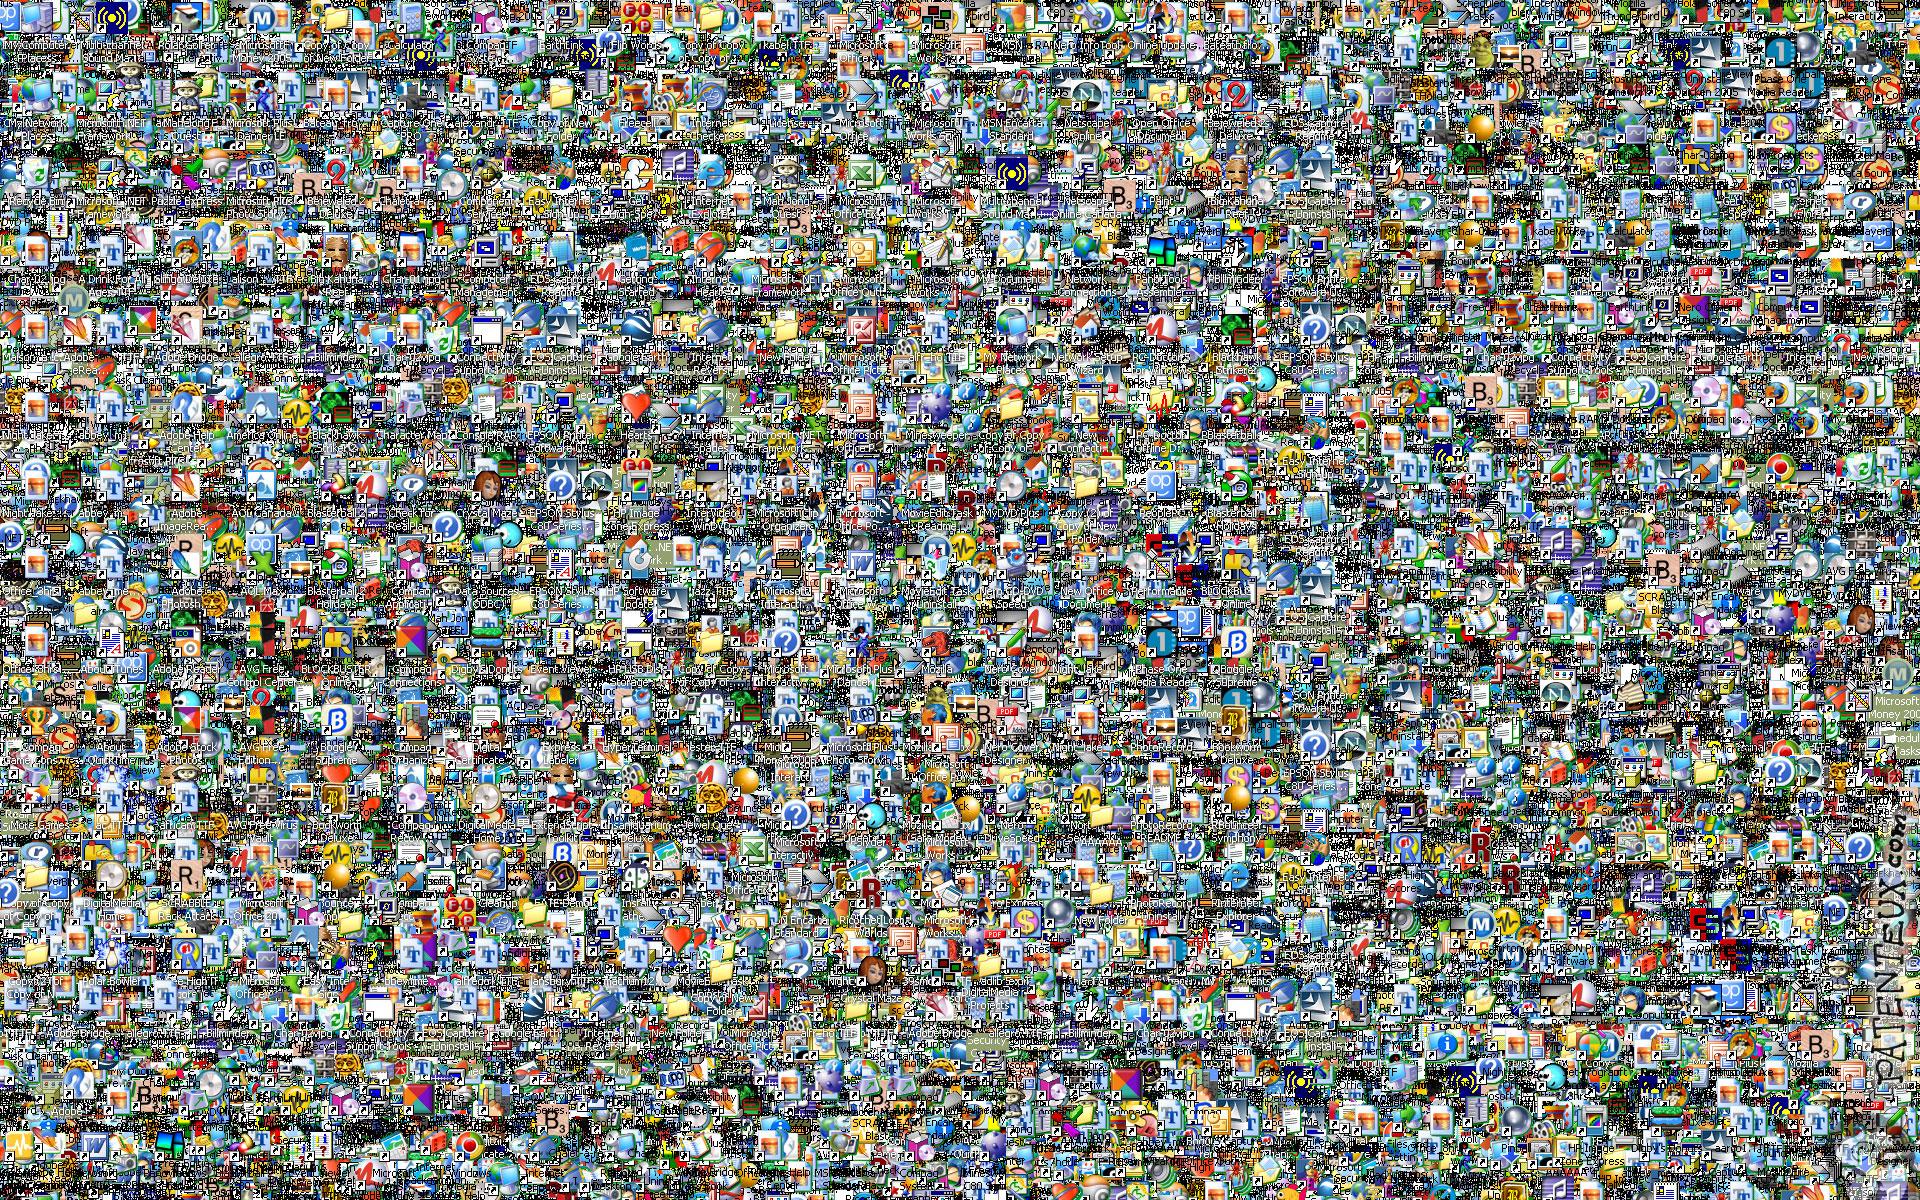 Crazy Desktop Backgrounds